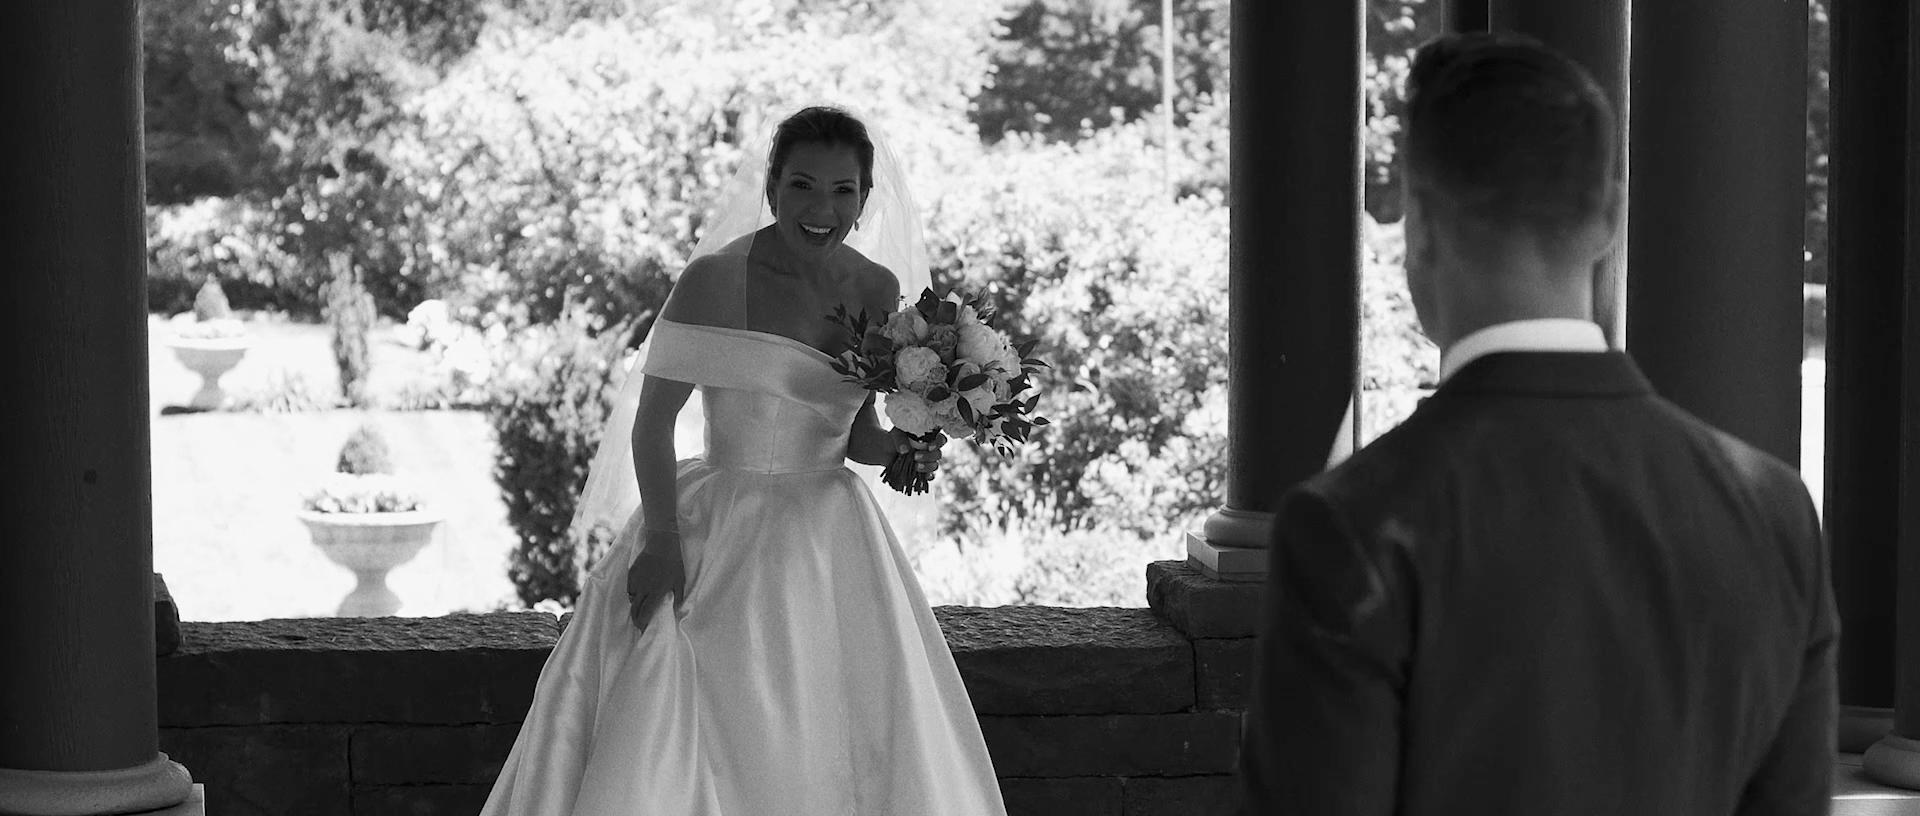 Lewis+Clark+College+Wedding+Videographer+Photographer_016.png